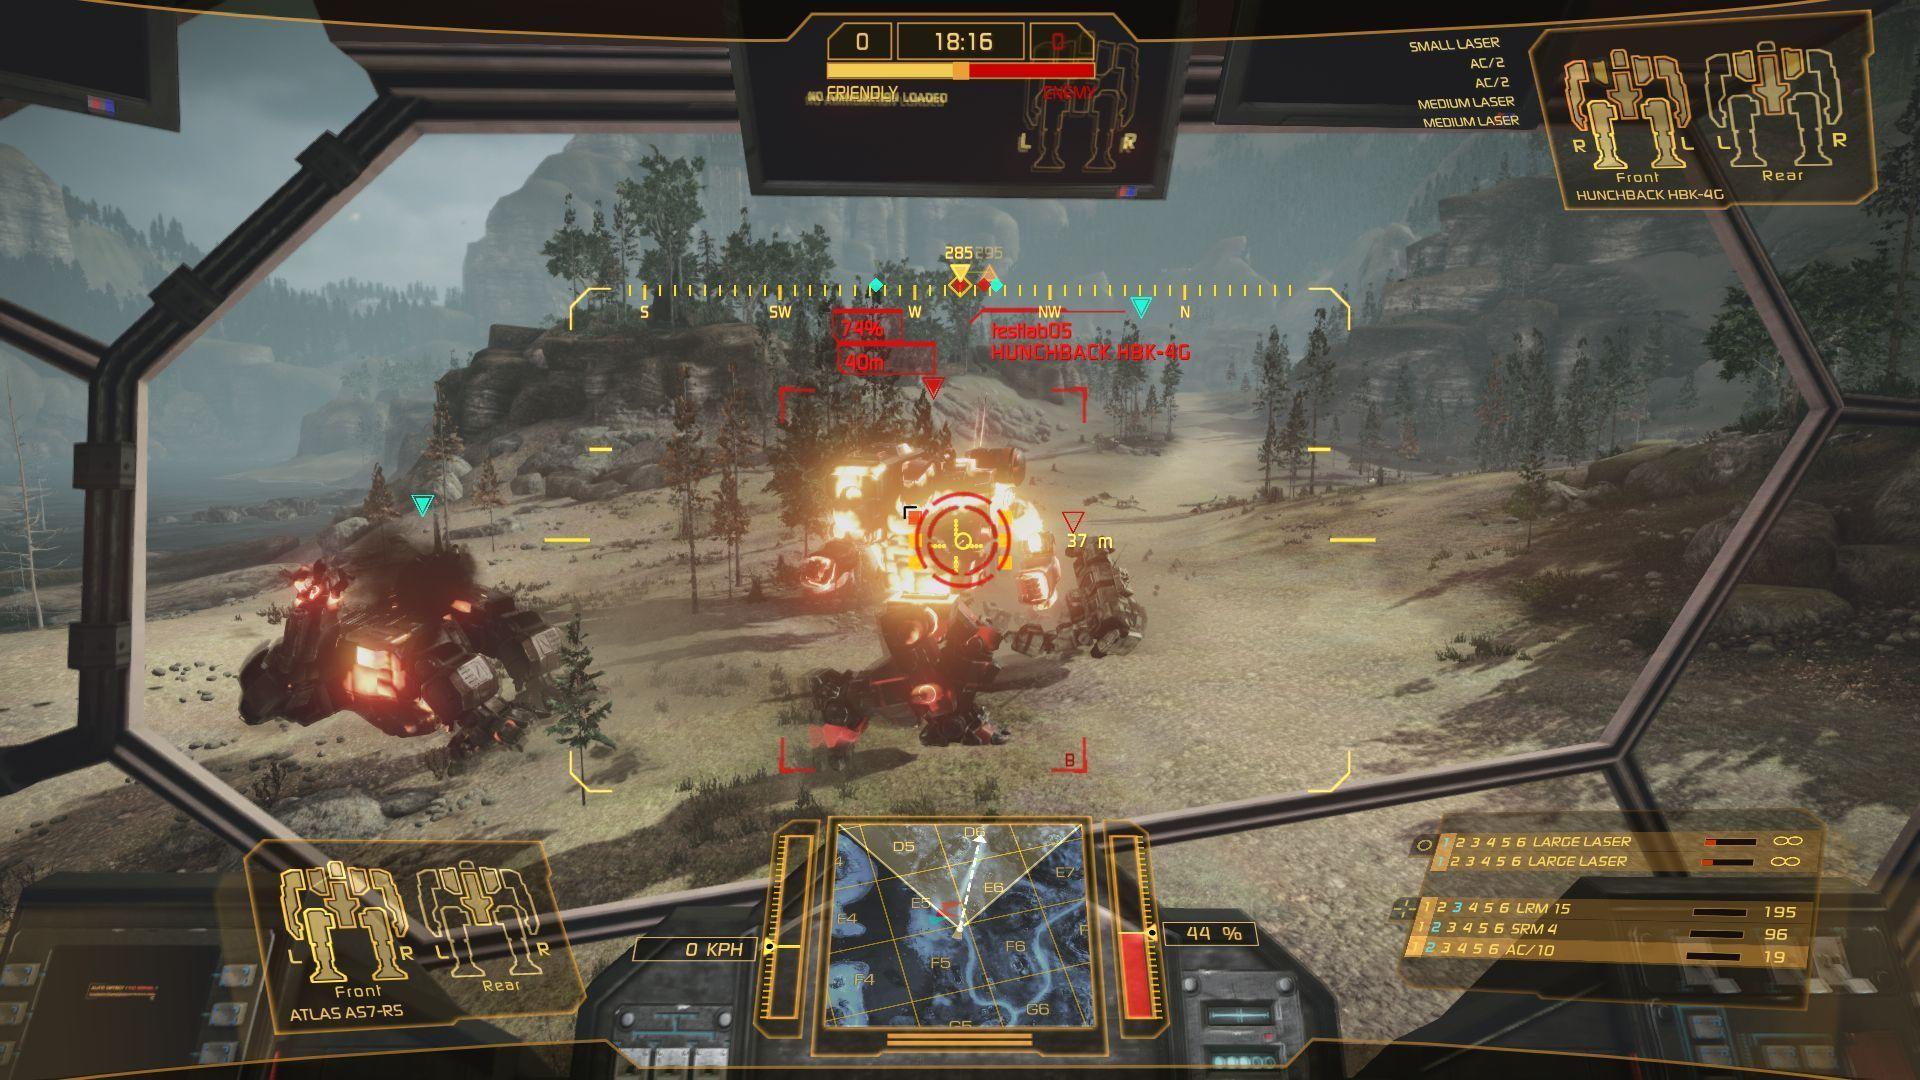 New Wallpaper Hd Boy And Girl Games Mechwarrior Online Megagames